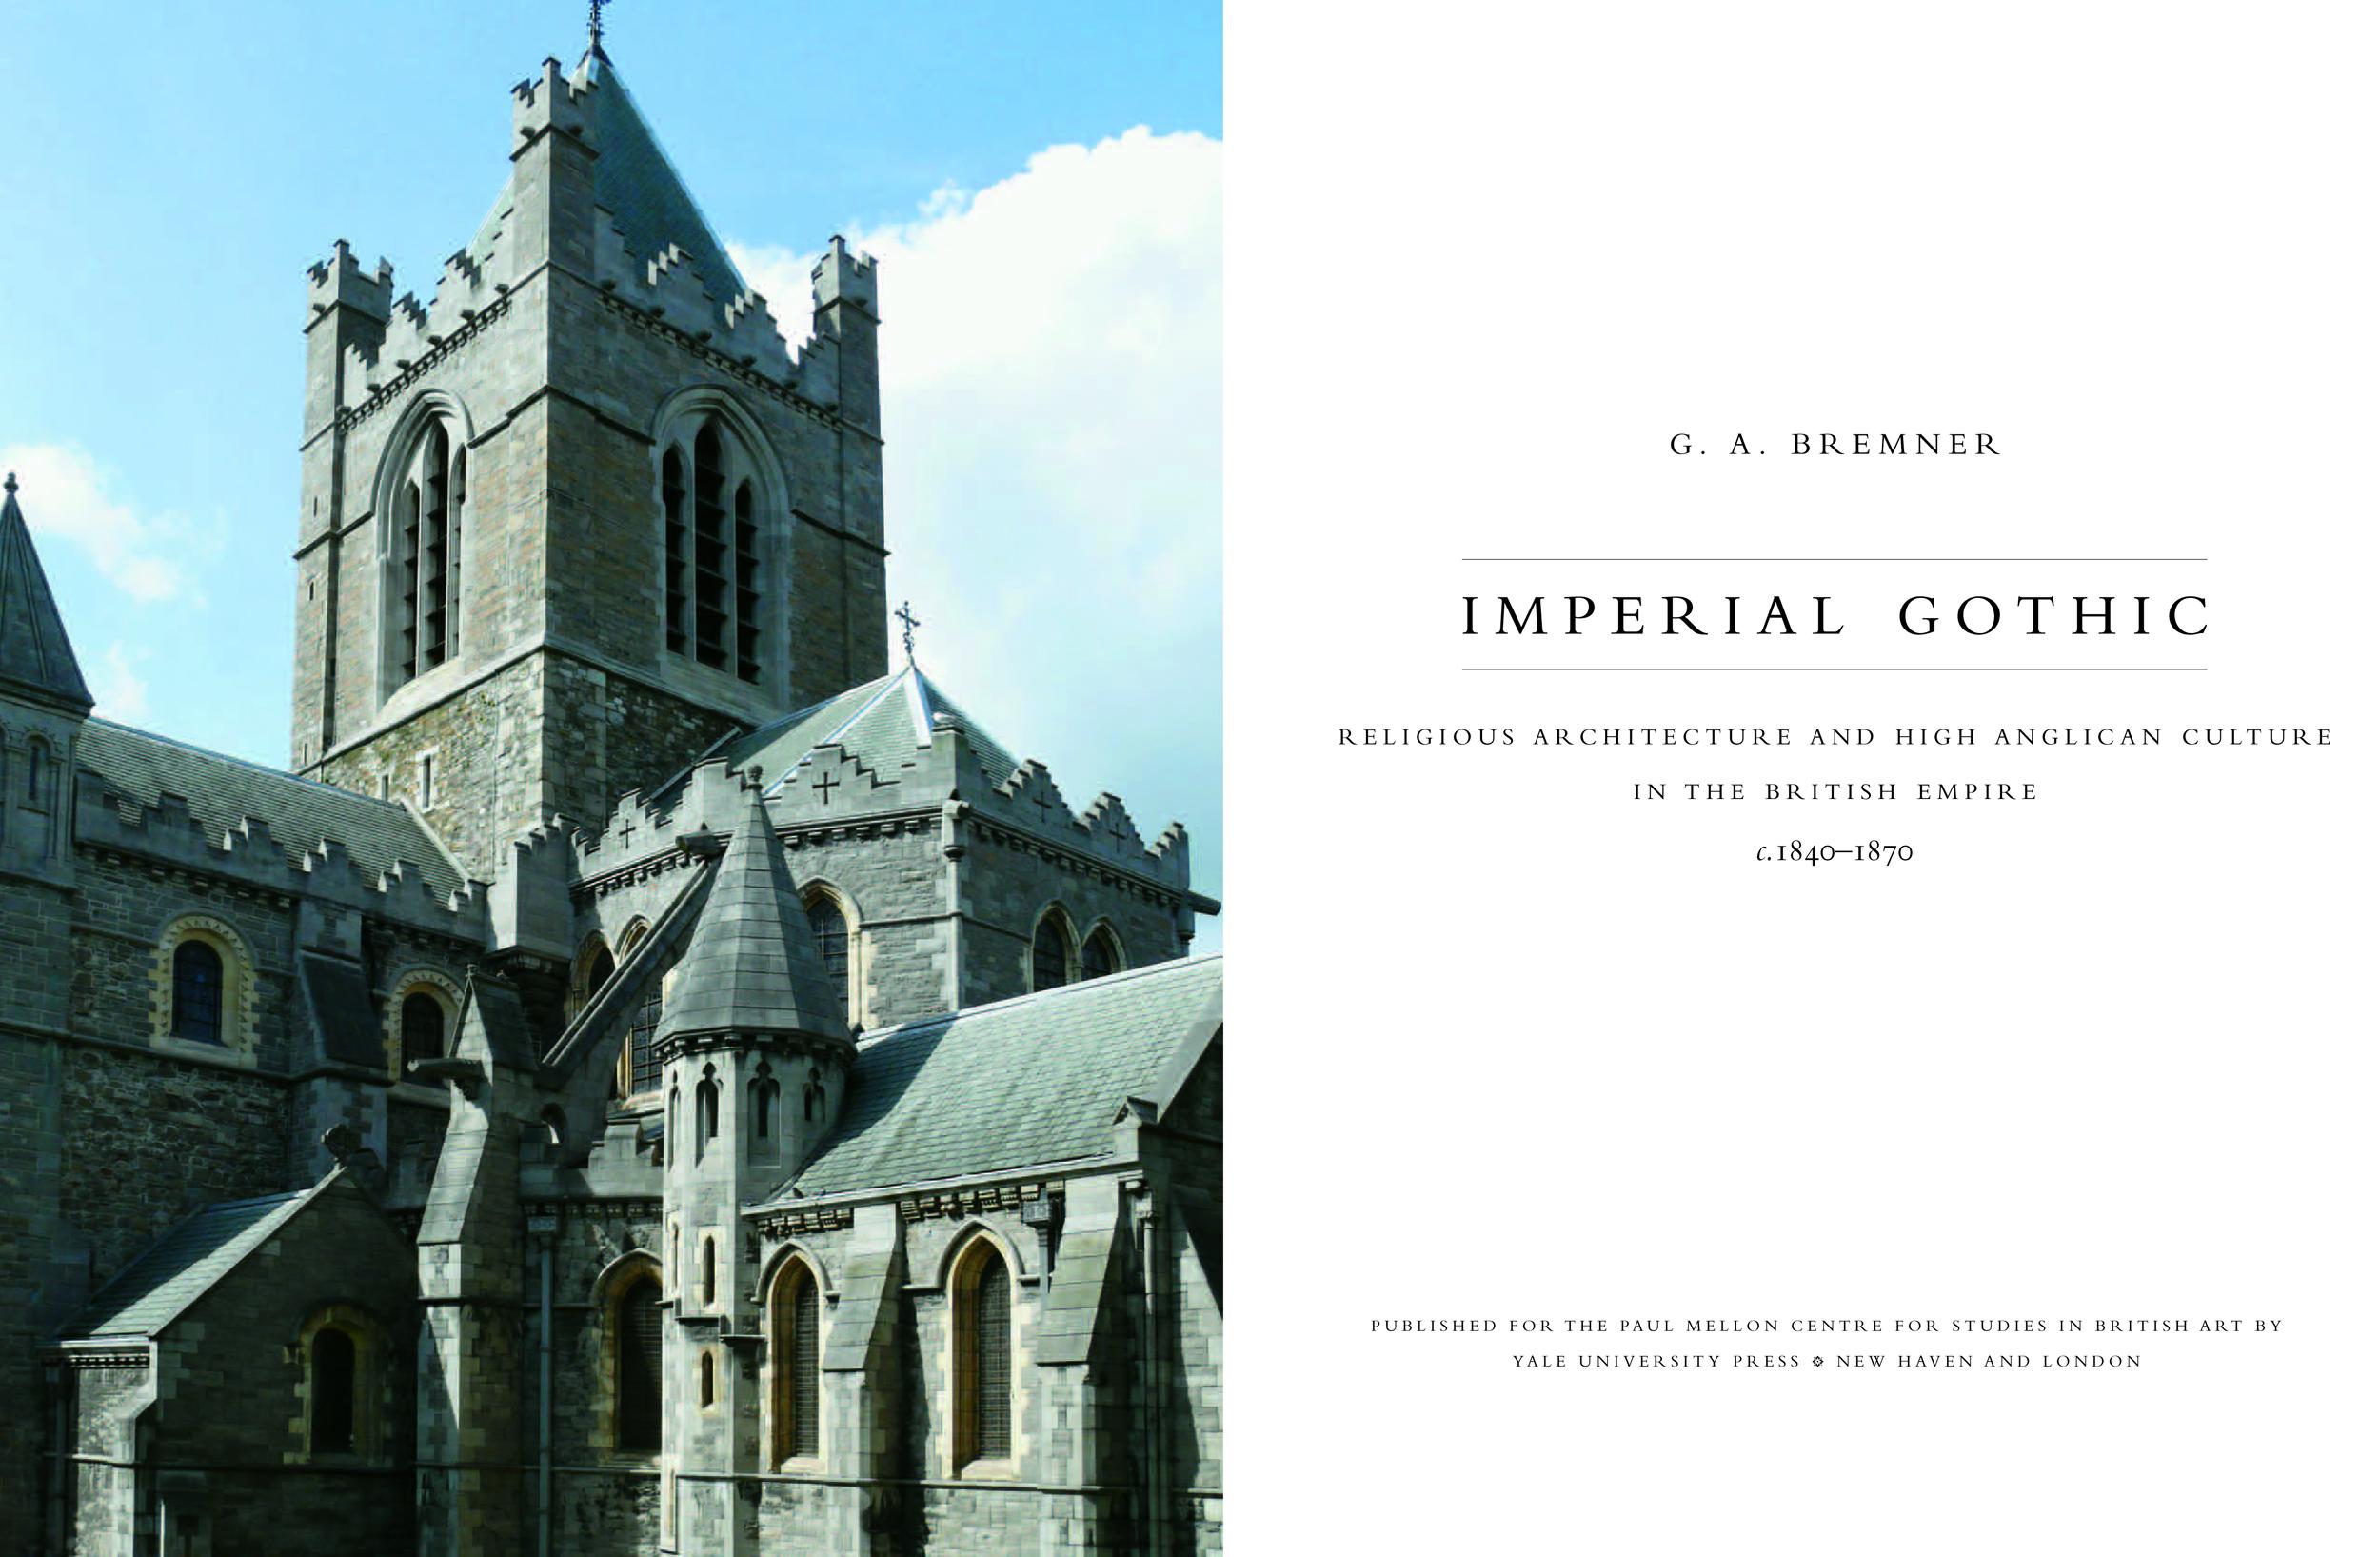 Imperial Gothic